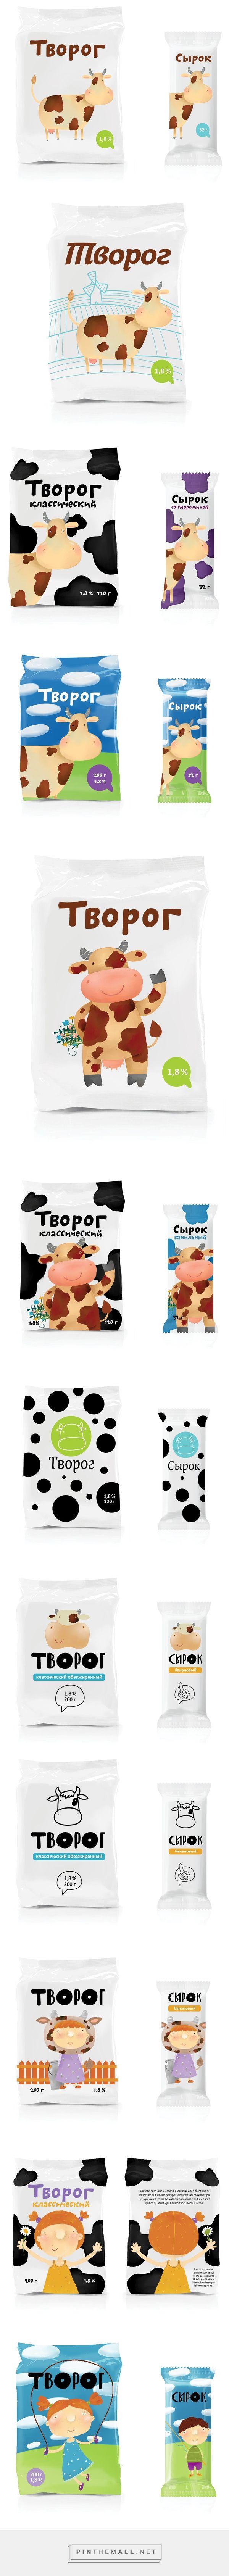 Оформление молочной продукции (Концепт) curated by Packaging Diva PD. The cutest #packaging to end your week : ) created via http://thebestpackaging.ru/2012/08/oformlenie-molochnoy-produktsii-kontsept.html